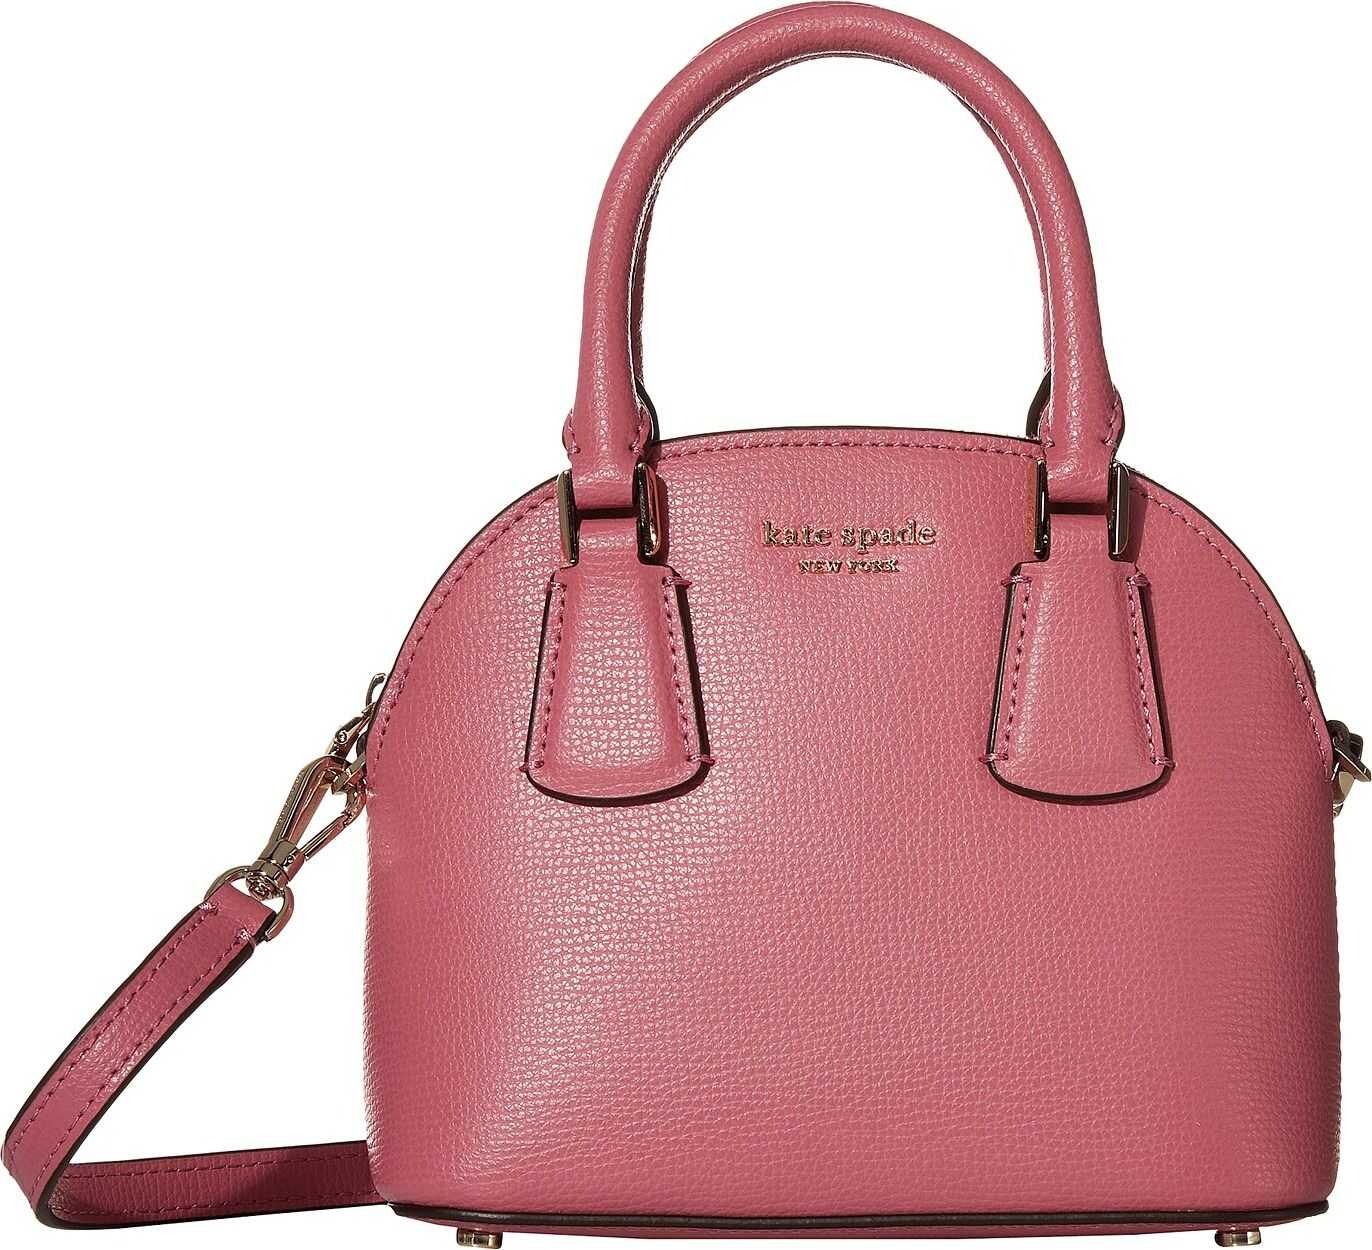 Kate Spade New York Sylvia Mini Dome Satchel Blustery Pink